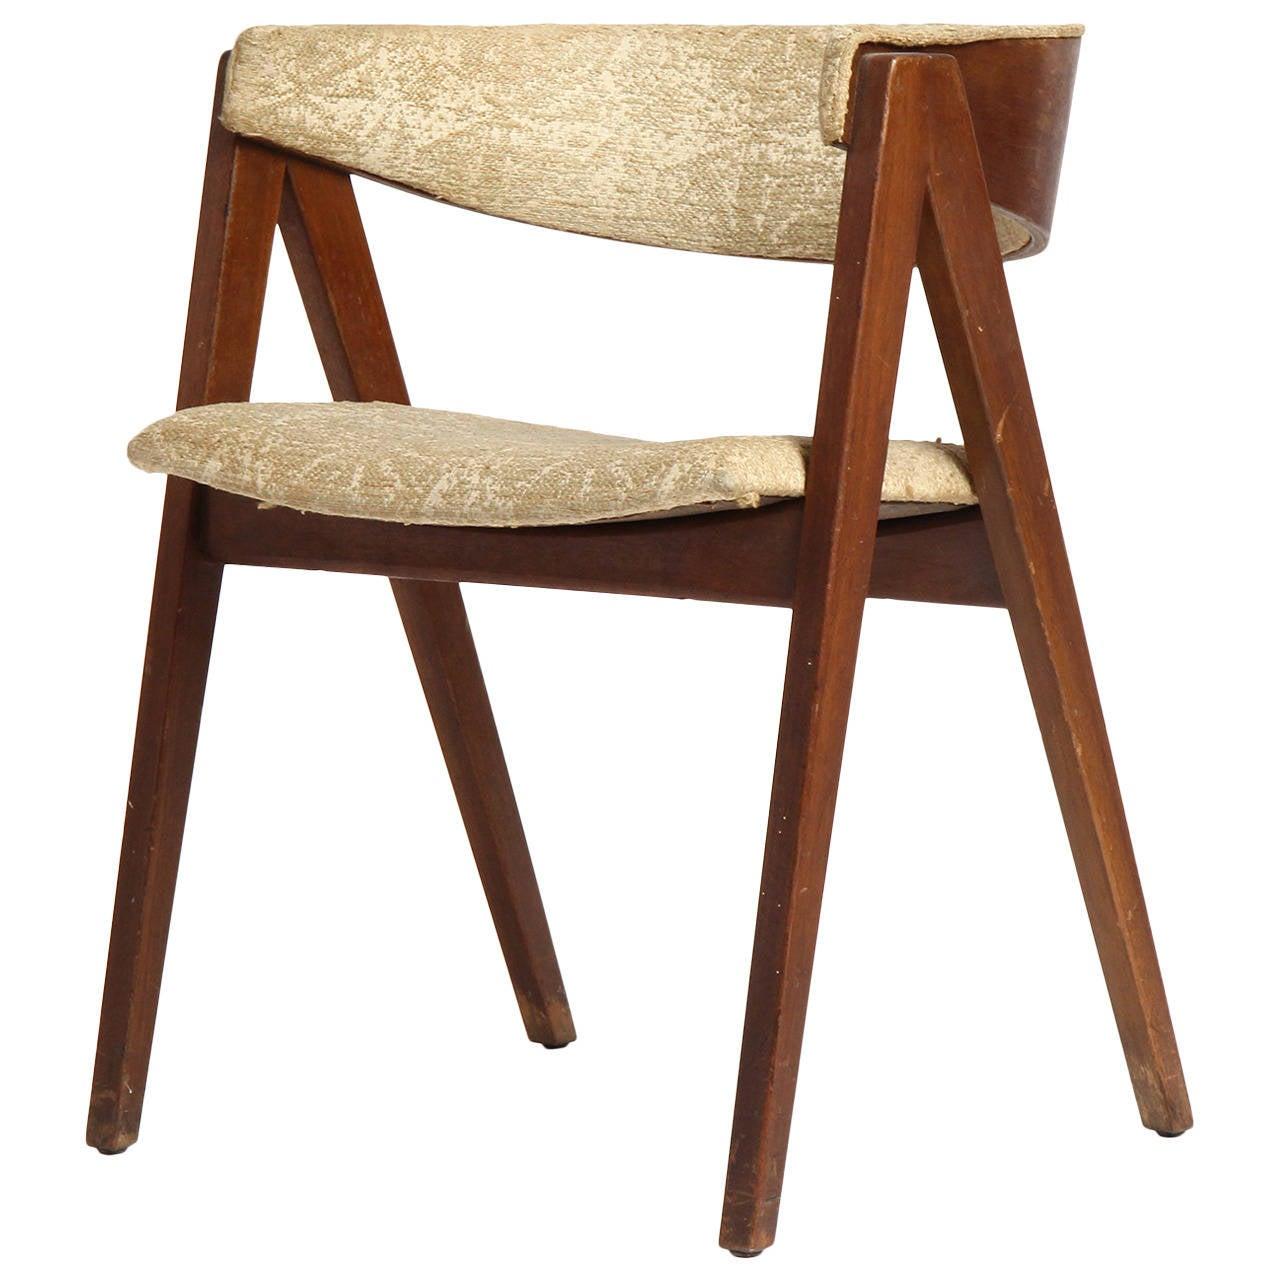 Chair by Allan Gould